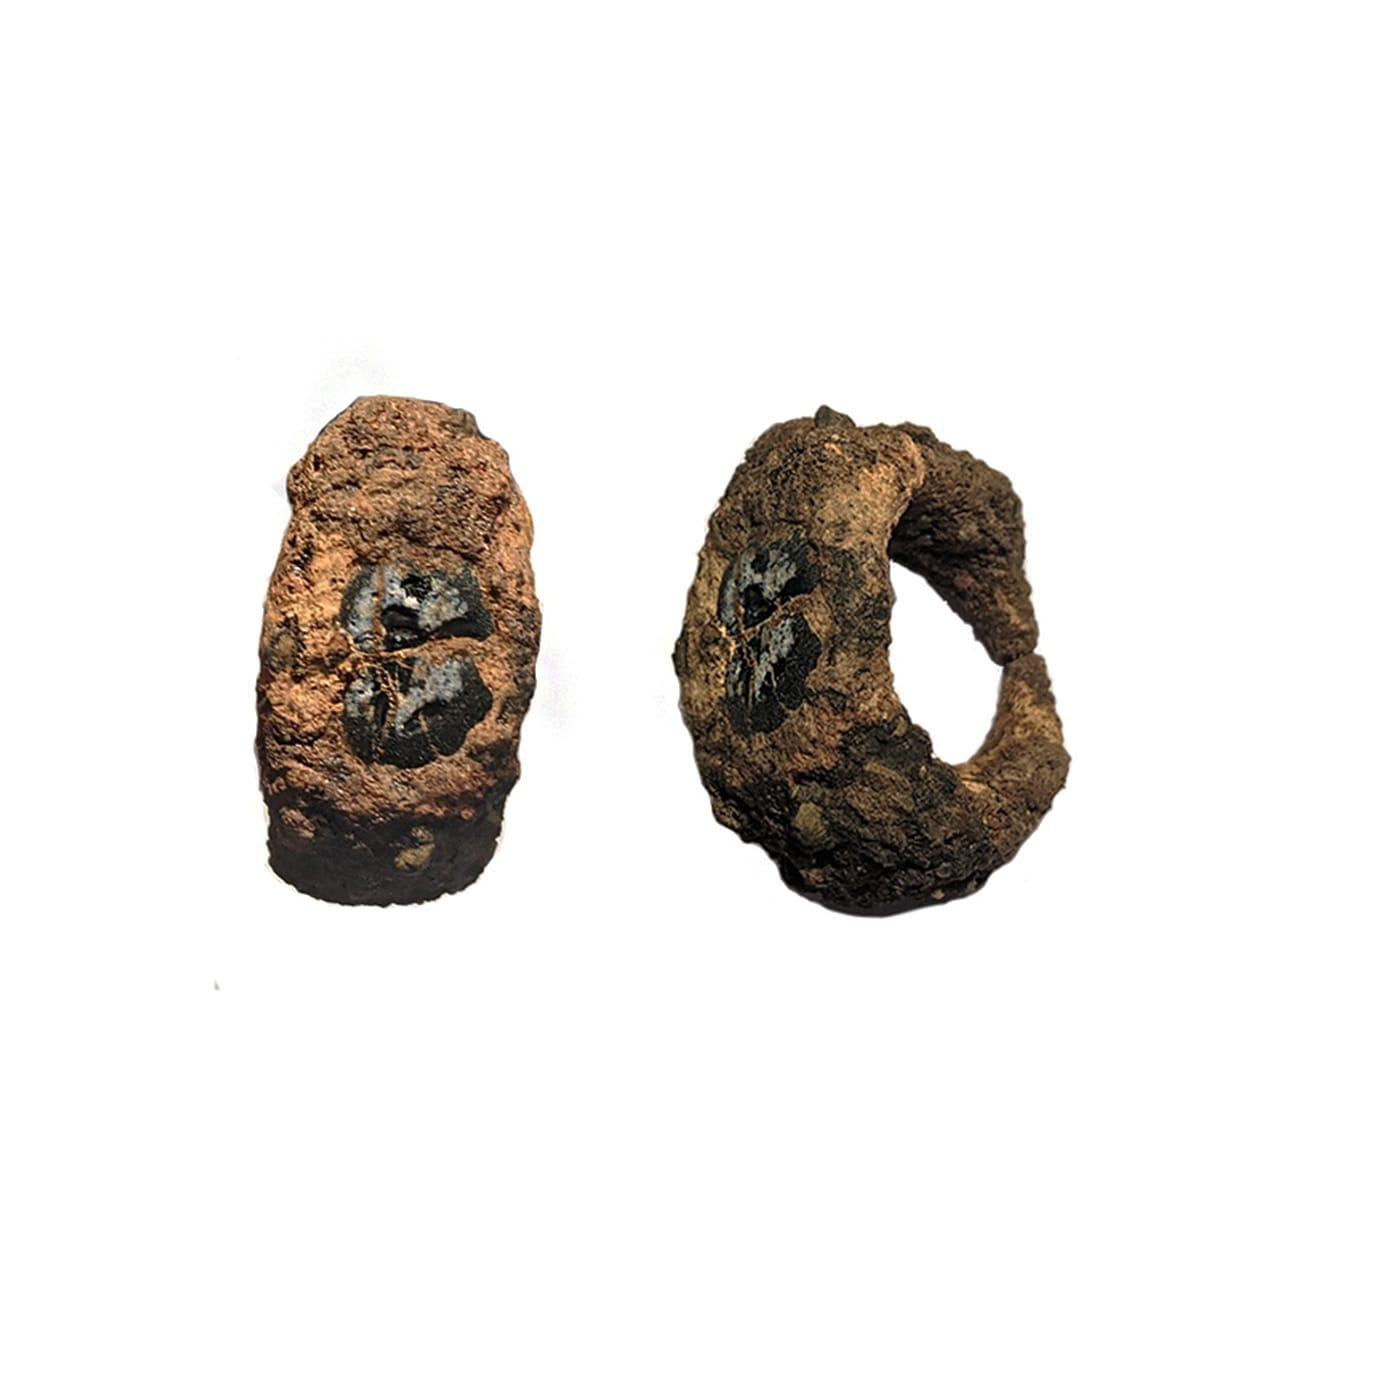 Roman Iron Ring with Intaglio - Anna Giecco